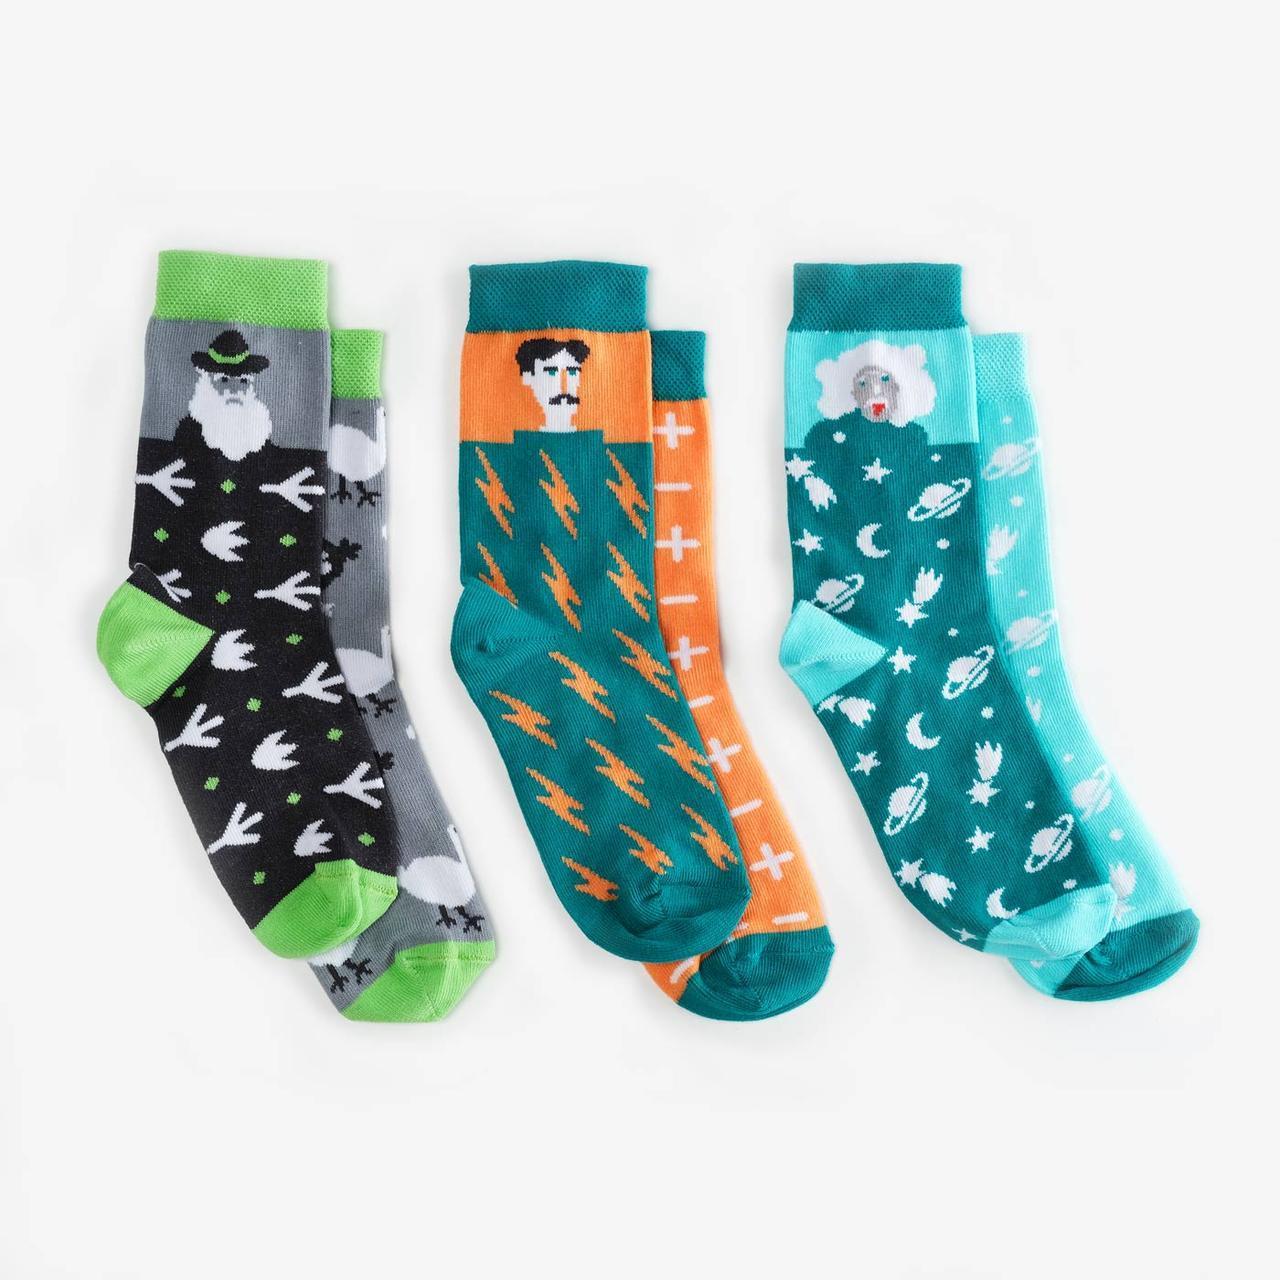 Носки детские Dodo Socks набор Kunsht 7-10 лет